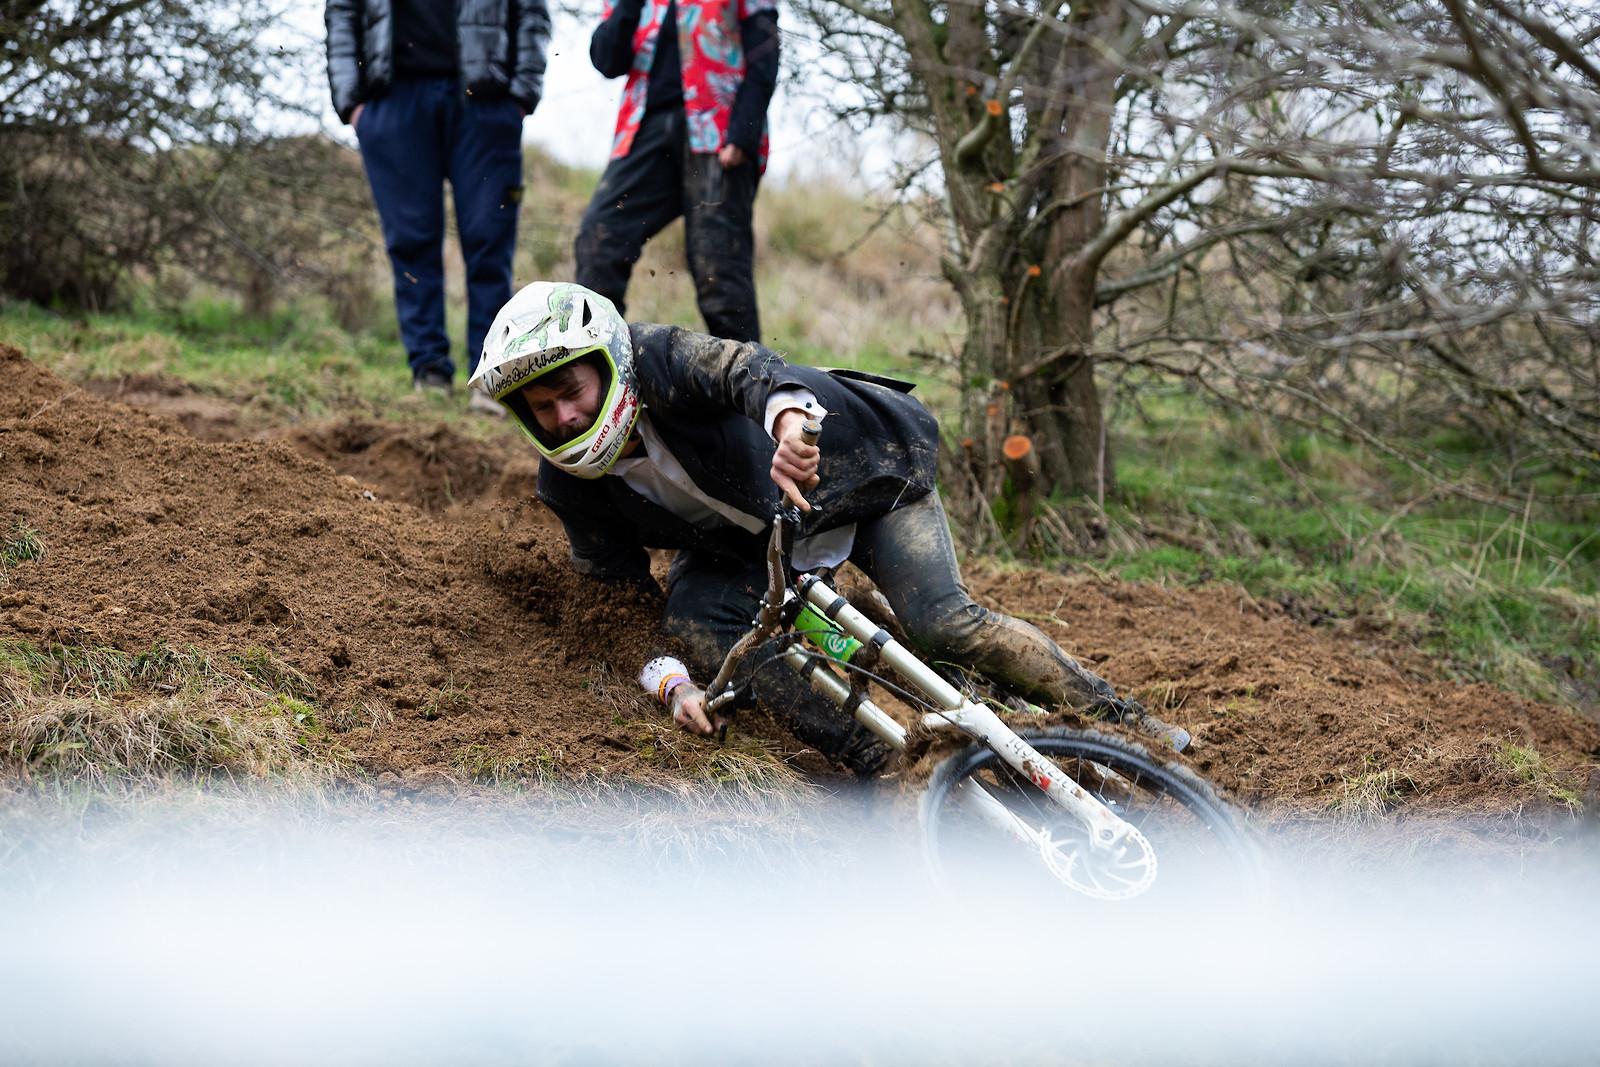 Bar Drag Challenge - Dadcamtv - Mountain Biking Pictures - Vital MTB